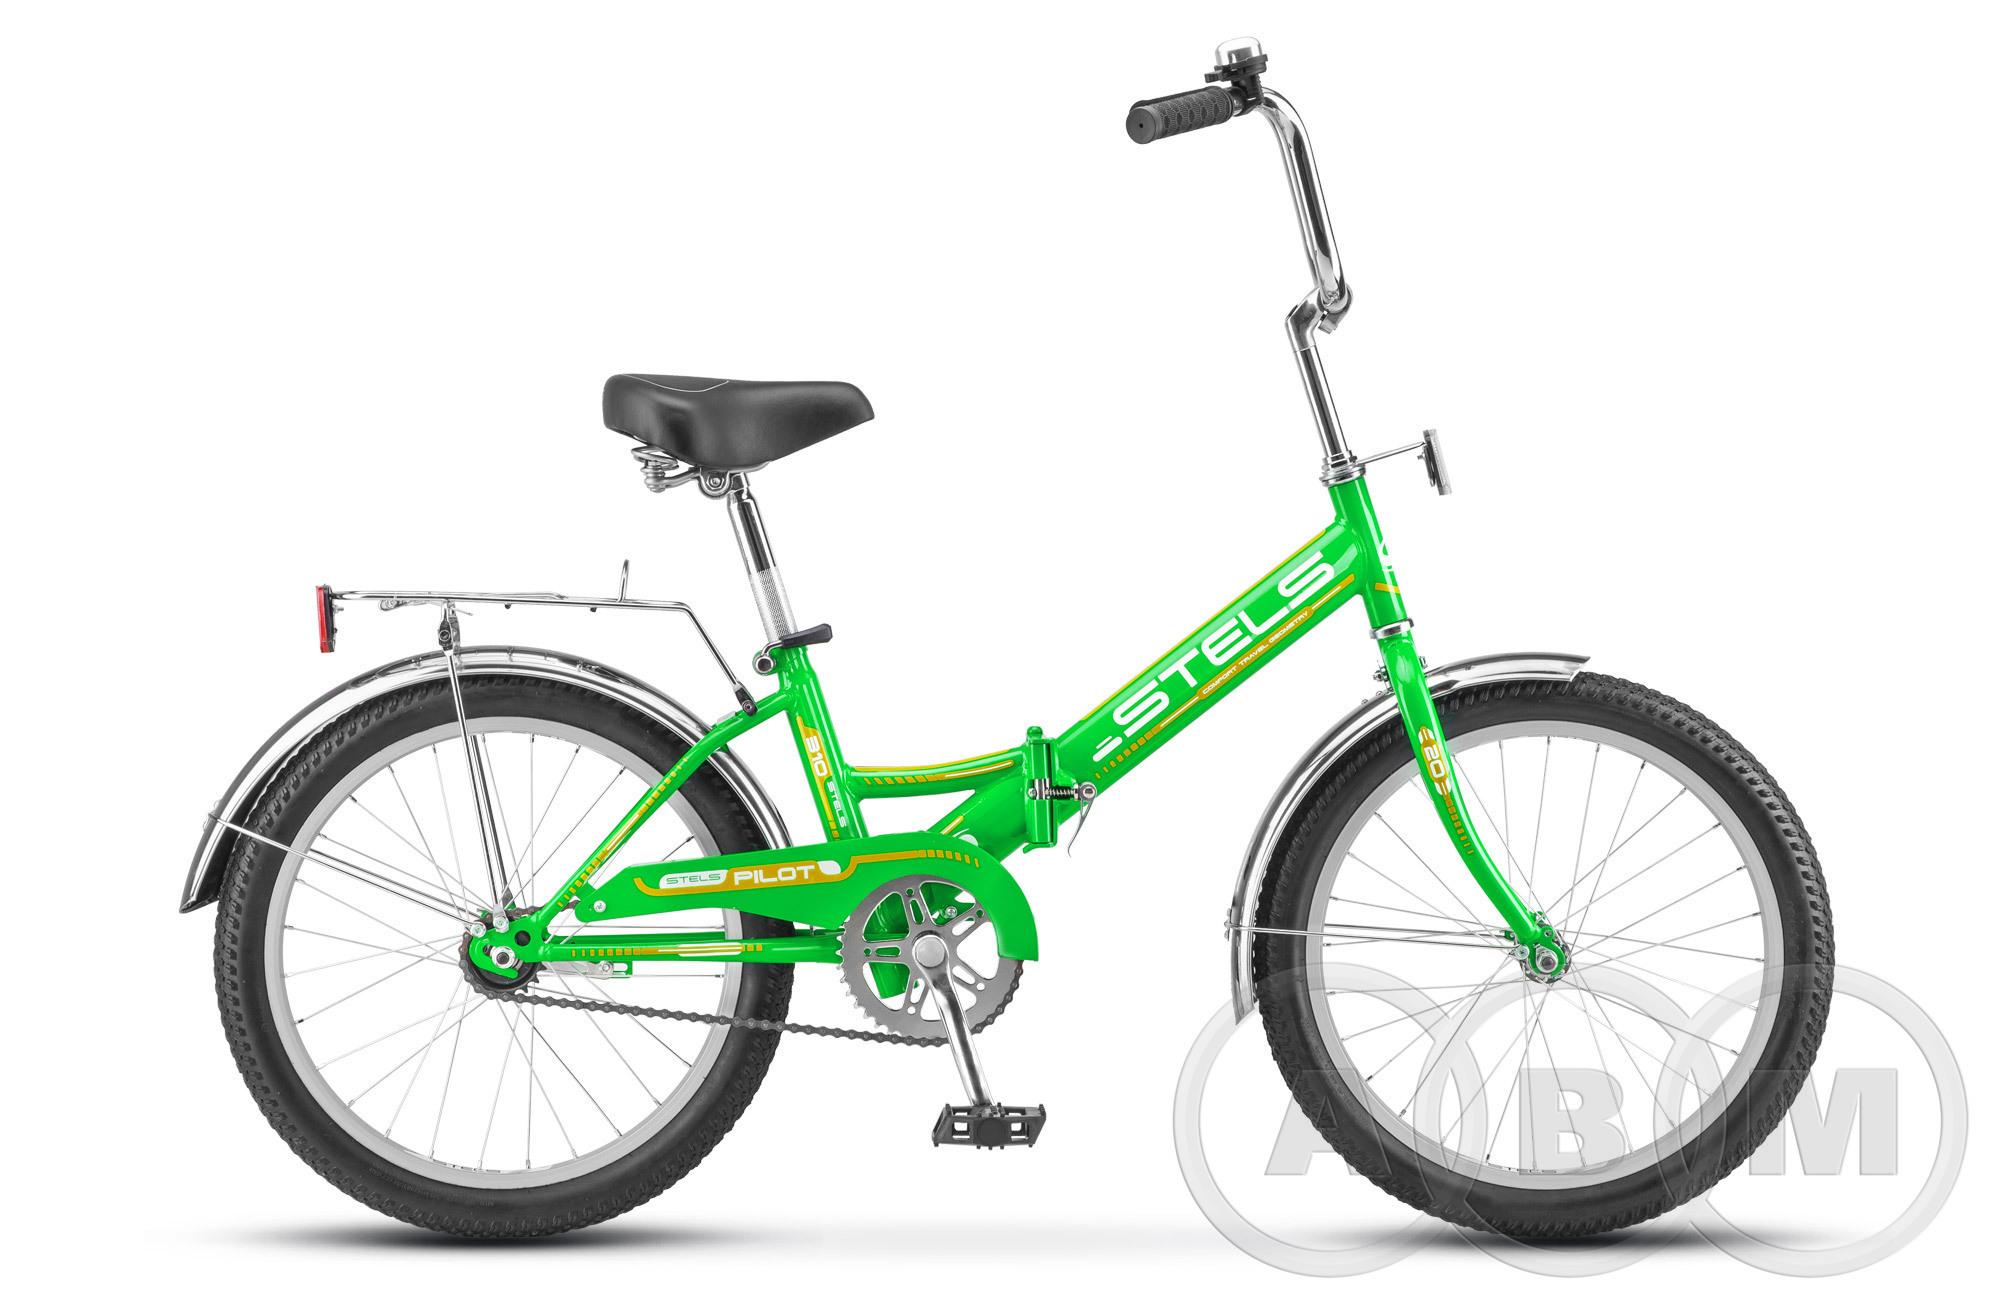 20 Велосипед Stels Pilot-310 1 ск.